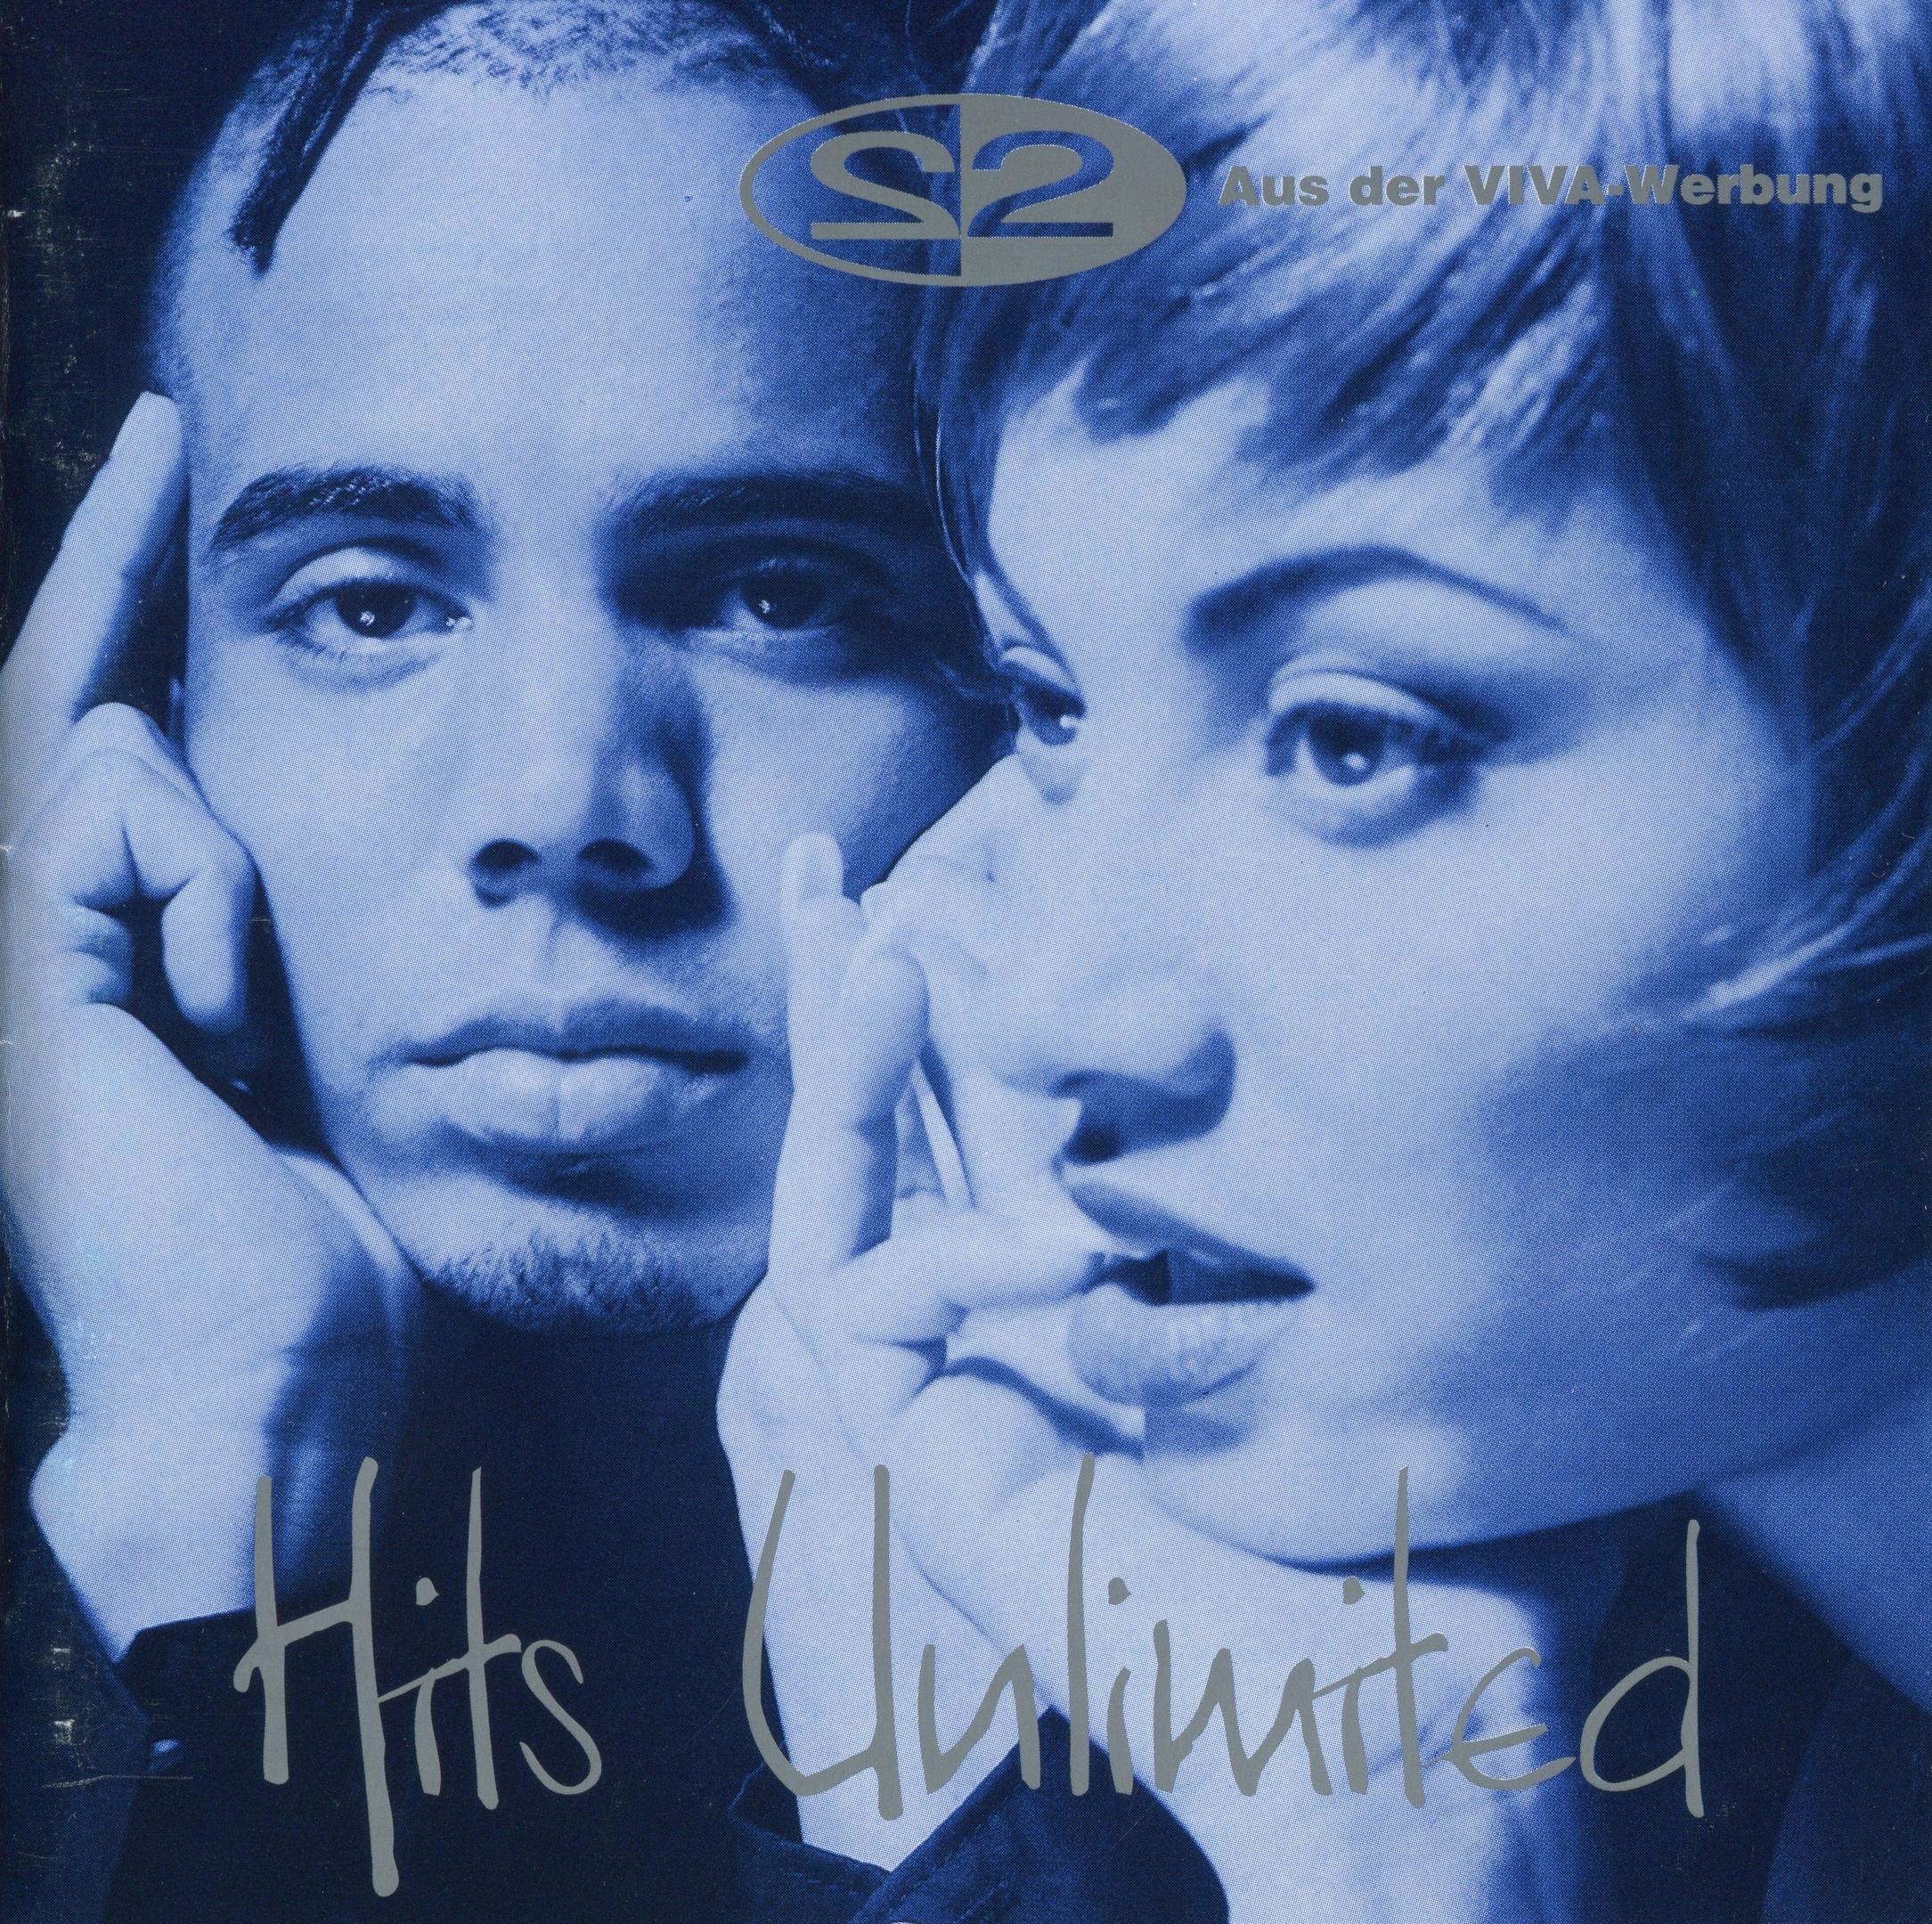 2 Unlimited album Hits Unlimited